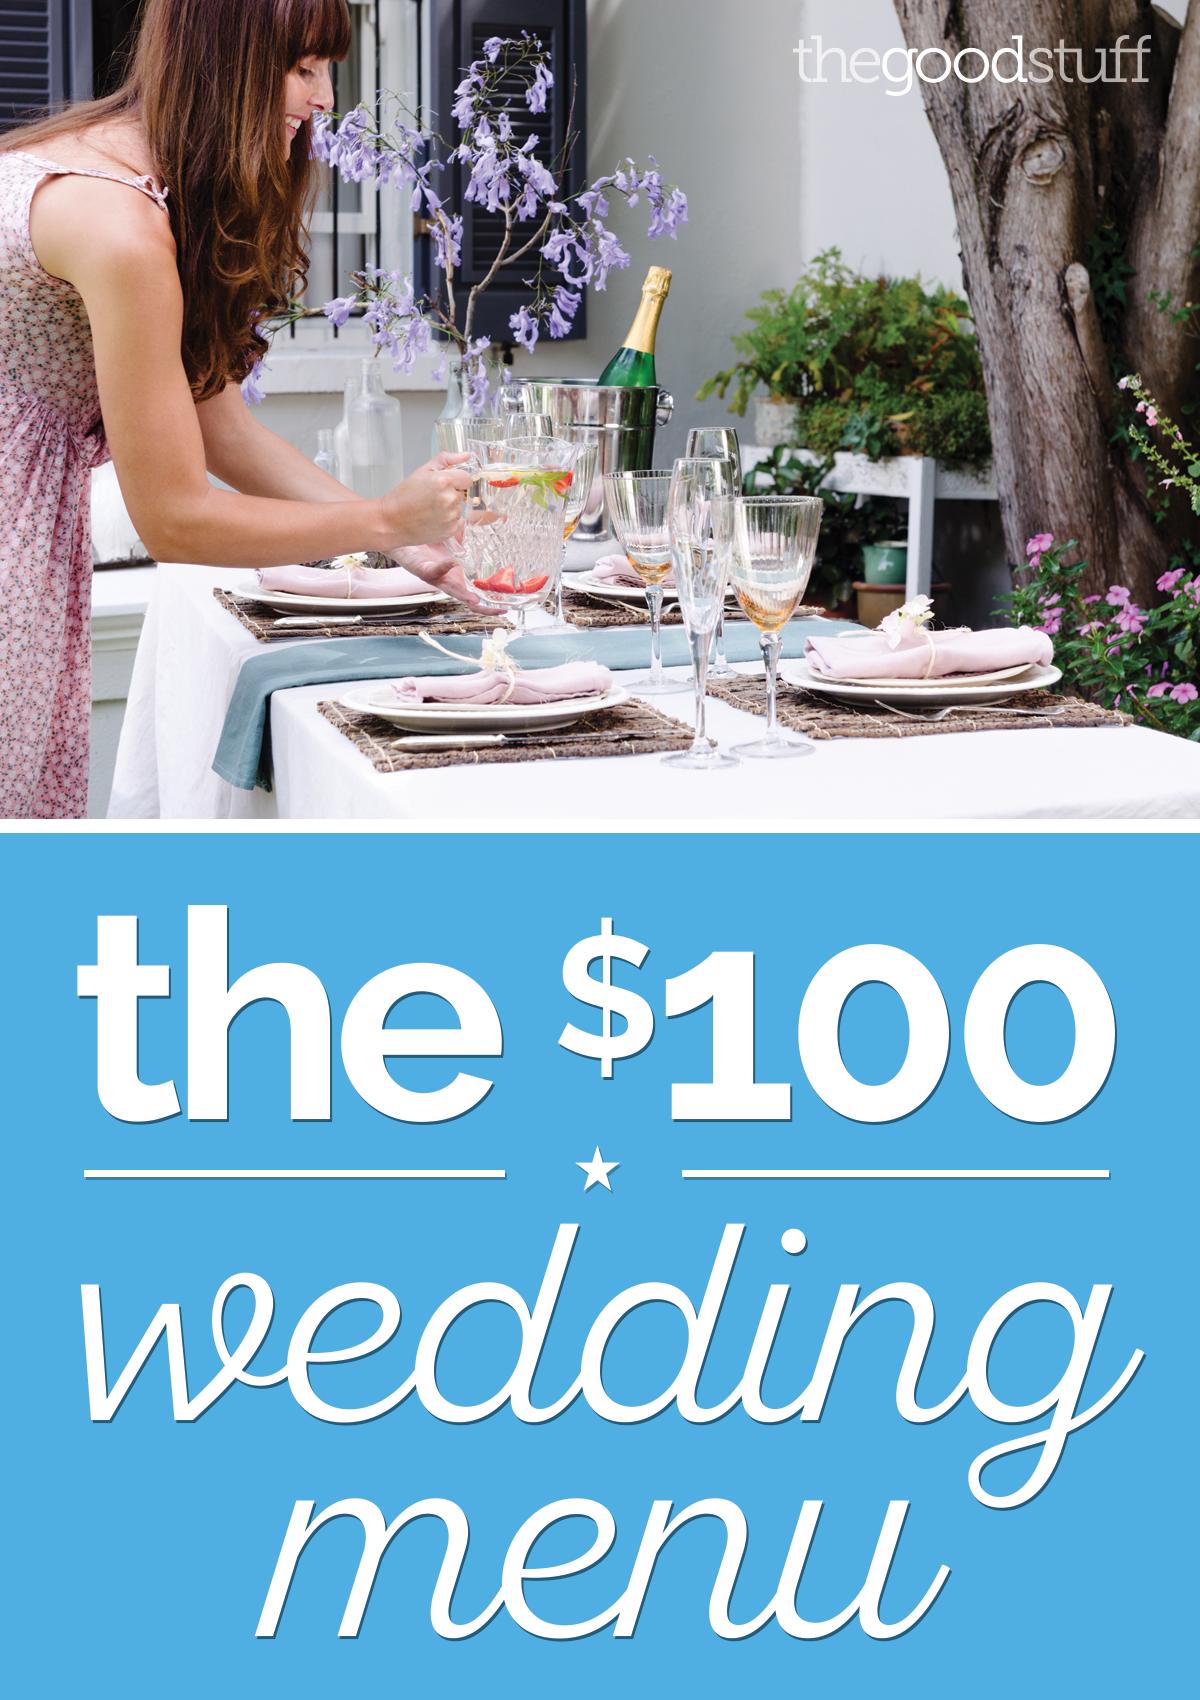 Vegetable menu for wedding